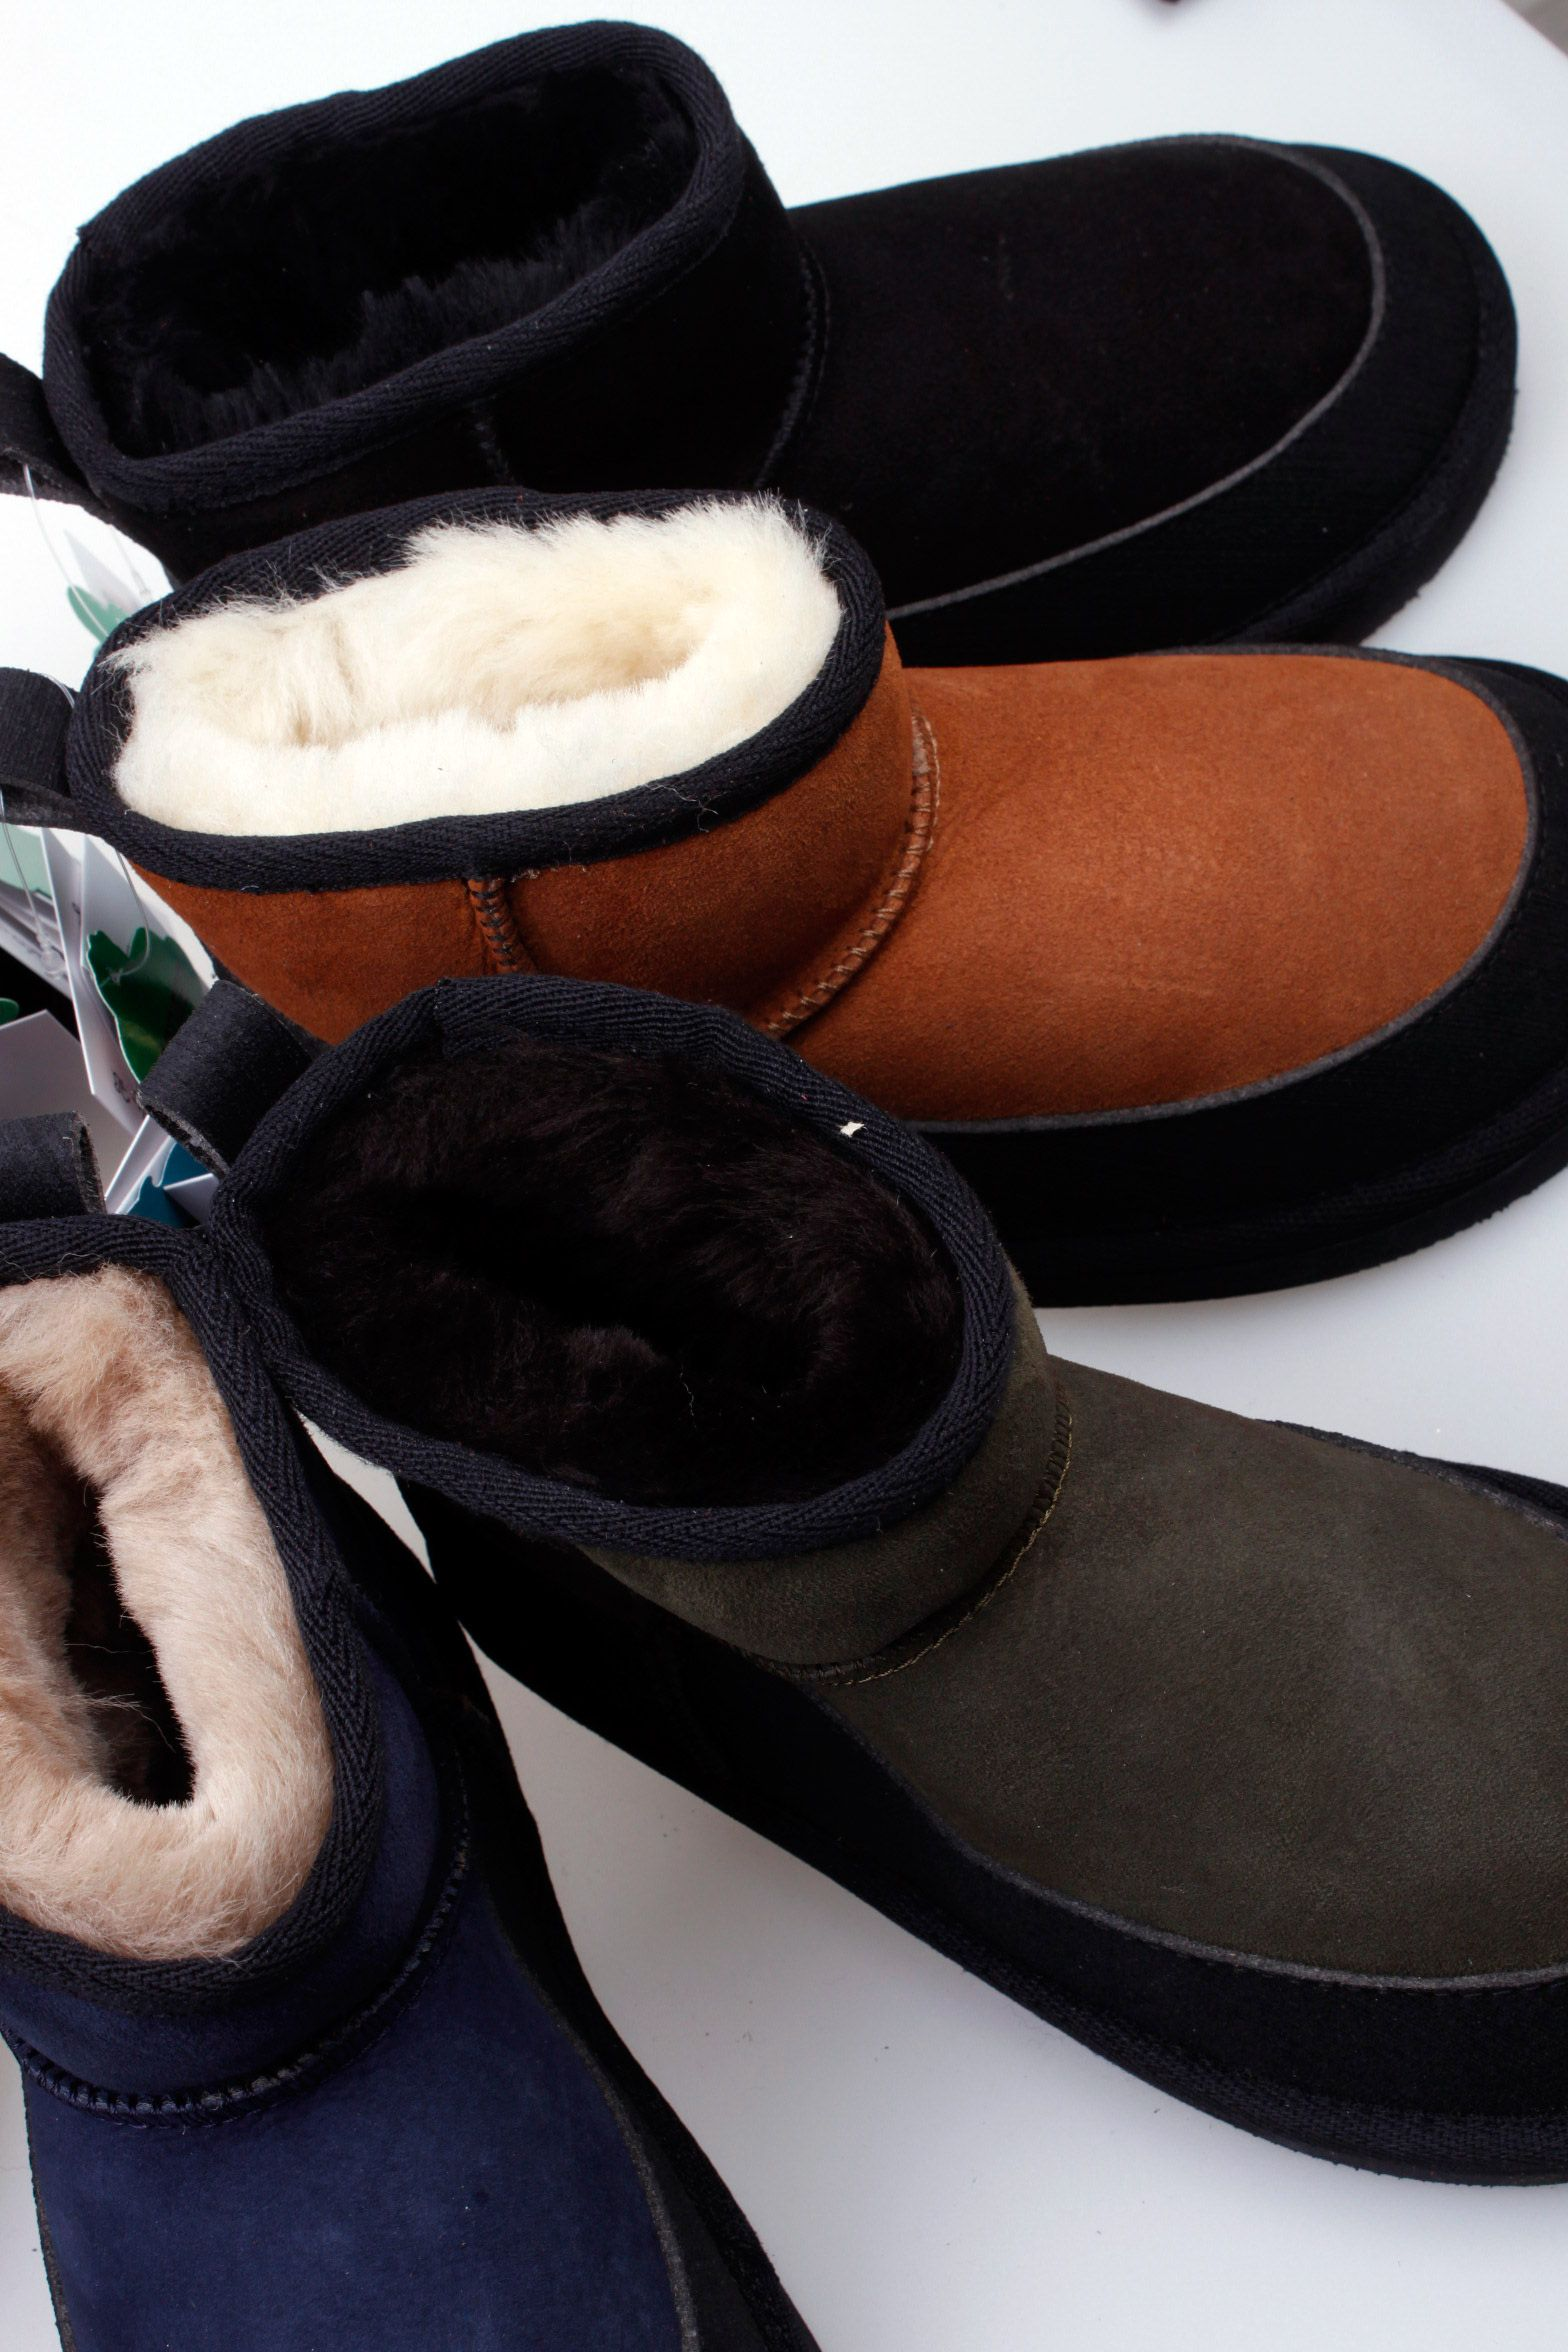 minimen МИНИМЕН shoes baby fashion moda girls boys orthopedic